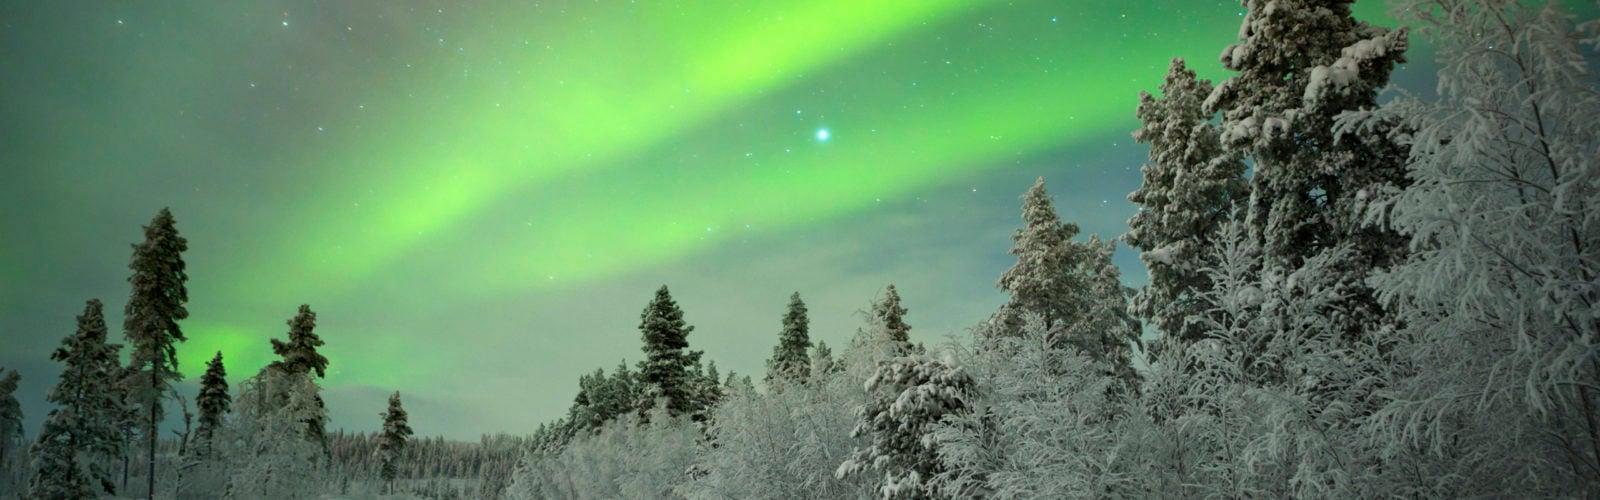 northern-lights-finnish-lapland